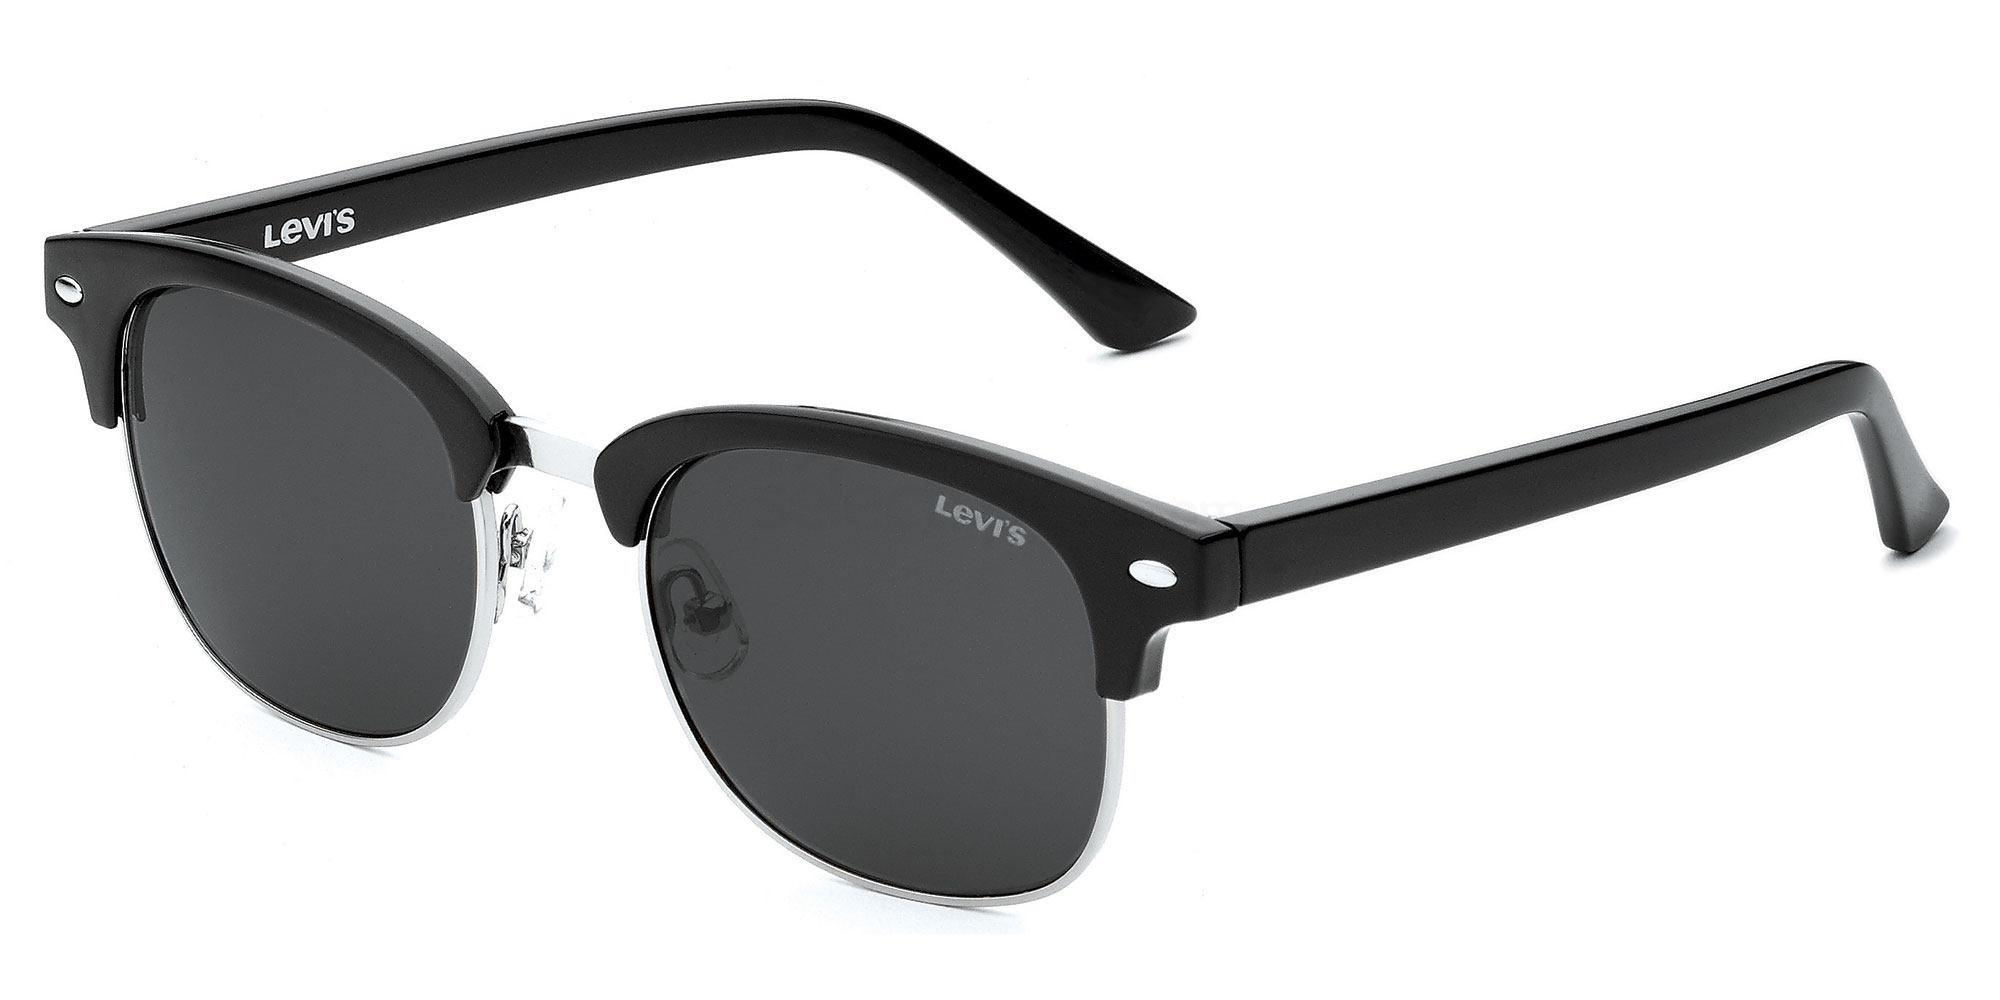 LO22387/01 LO22387 Sunglasses, Levi's Eyewear